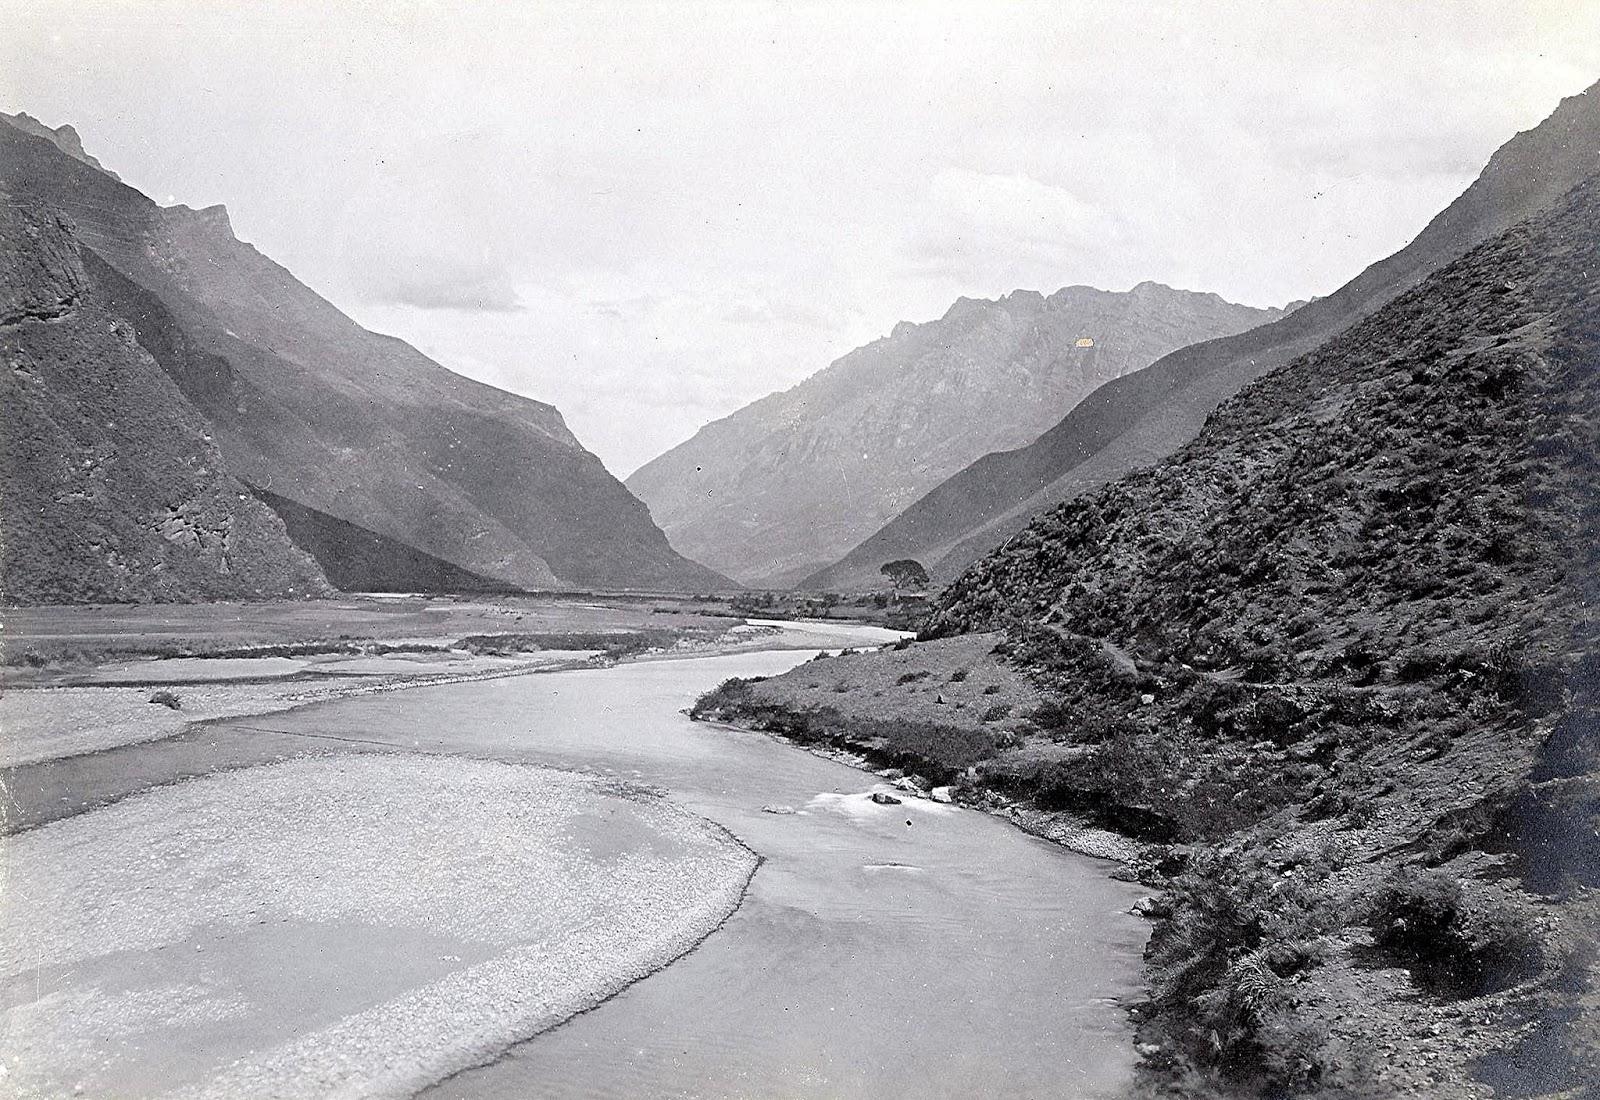 Foto antigua del río Vilcanota en el Cusco